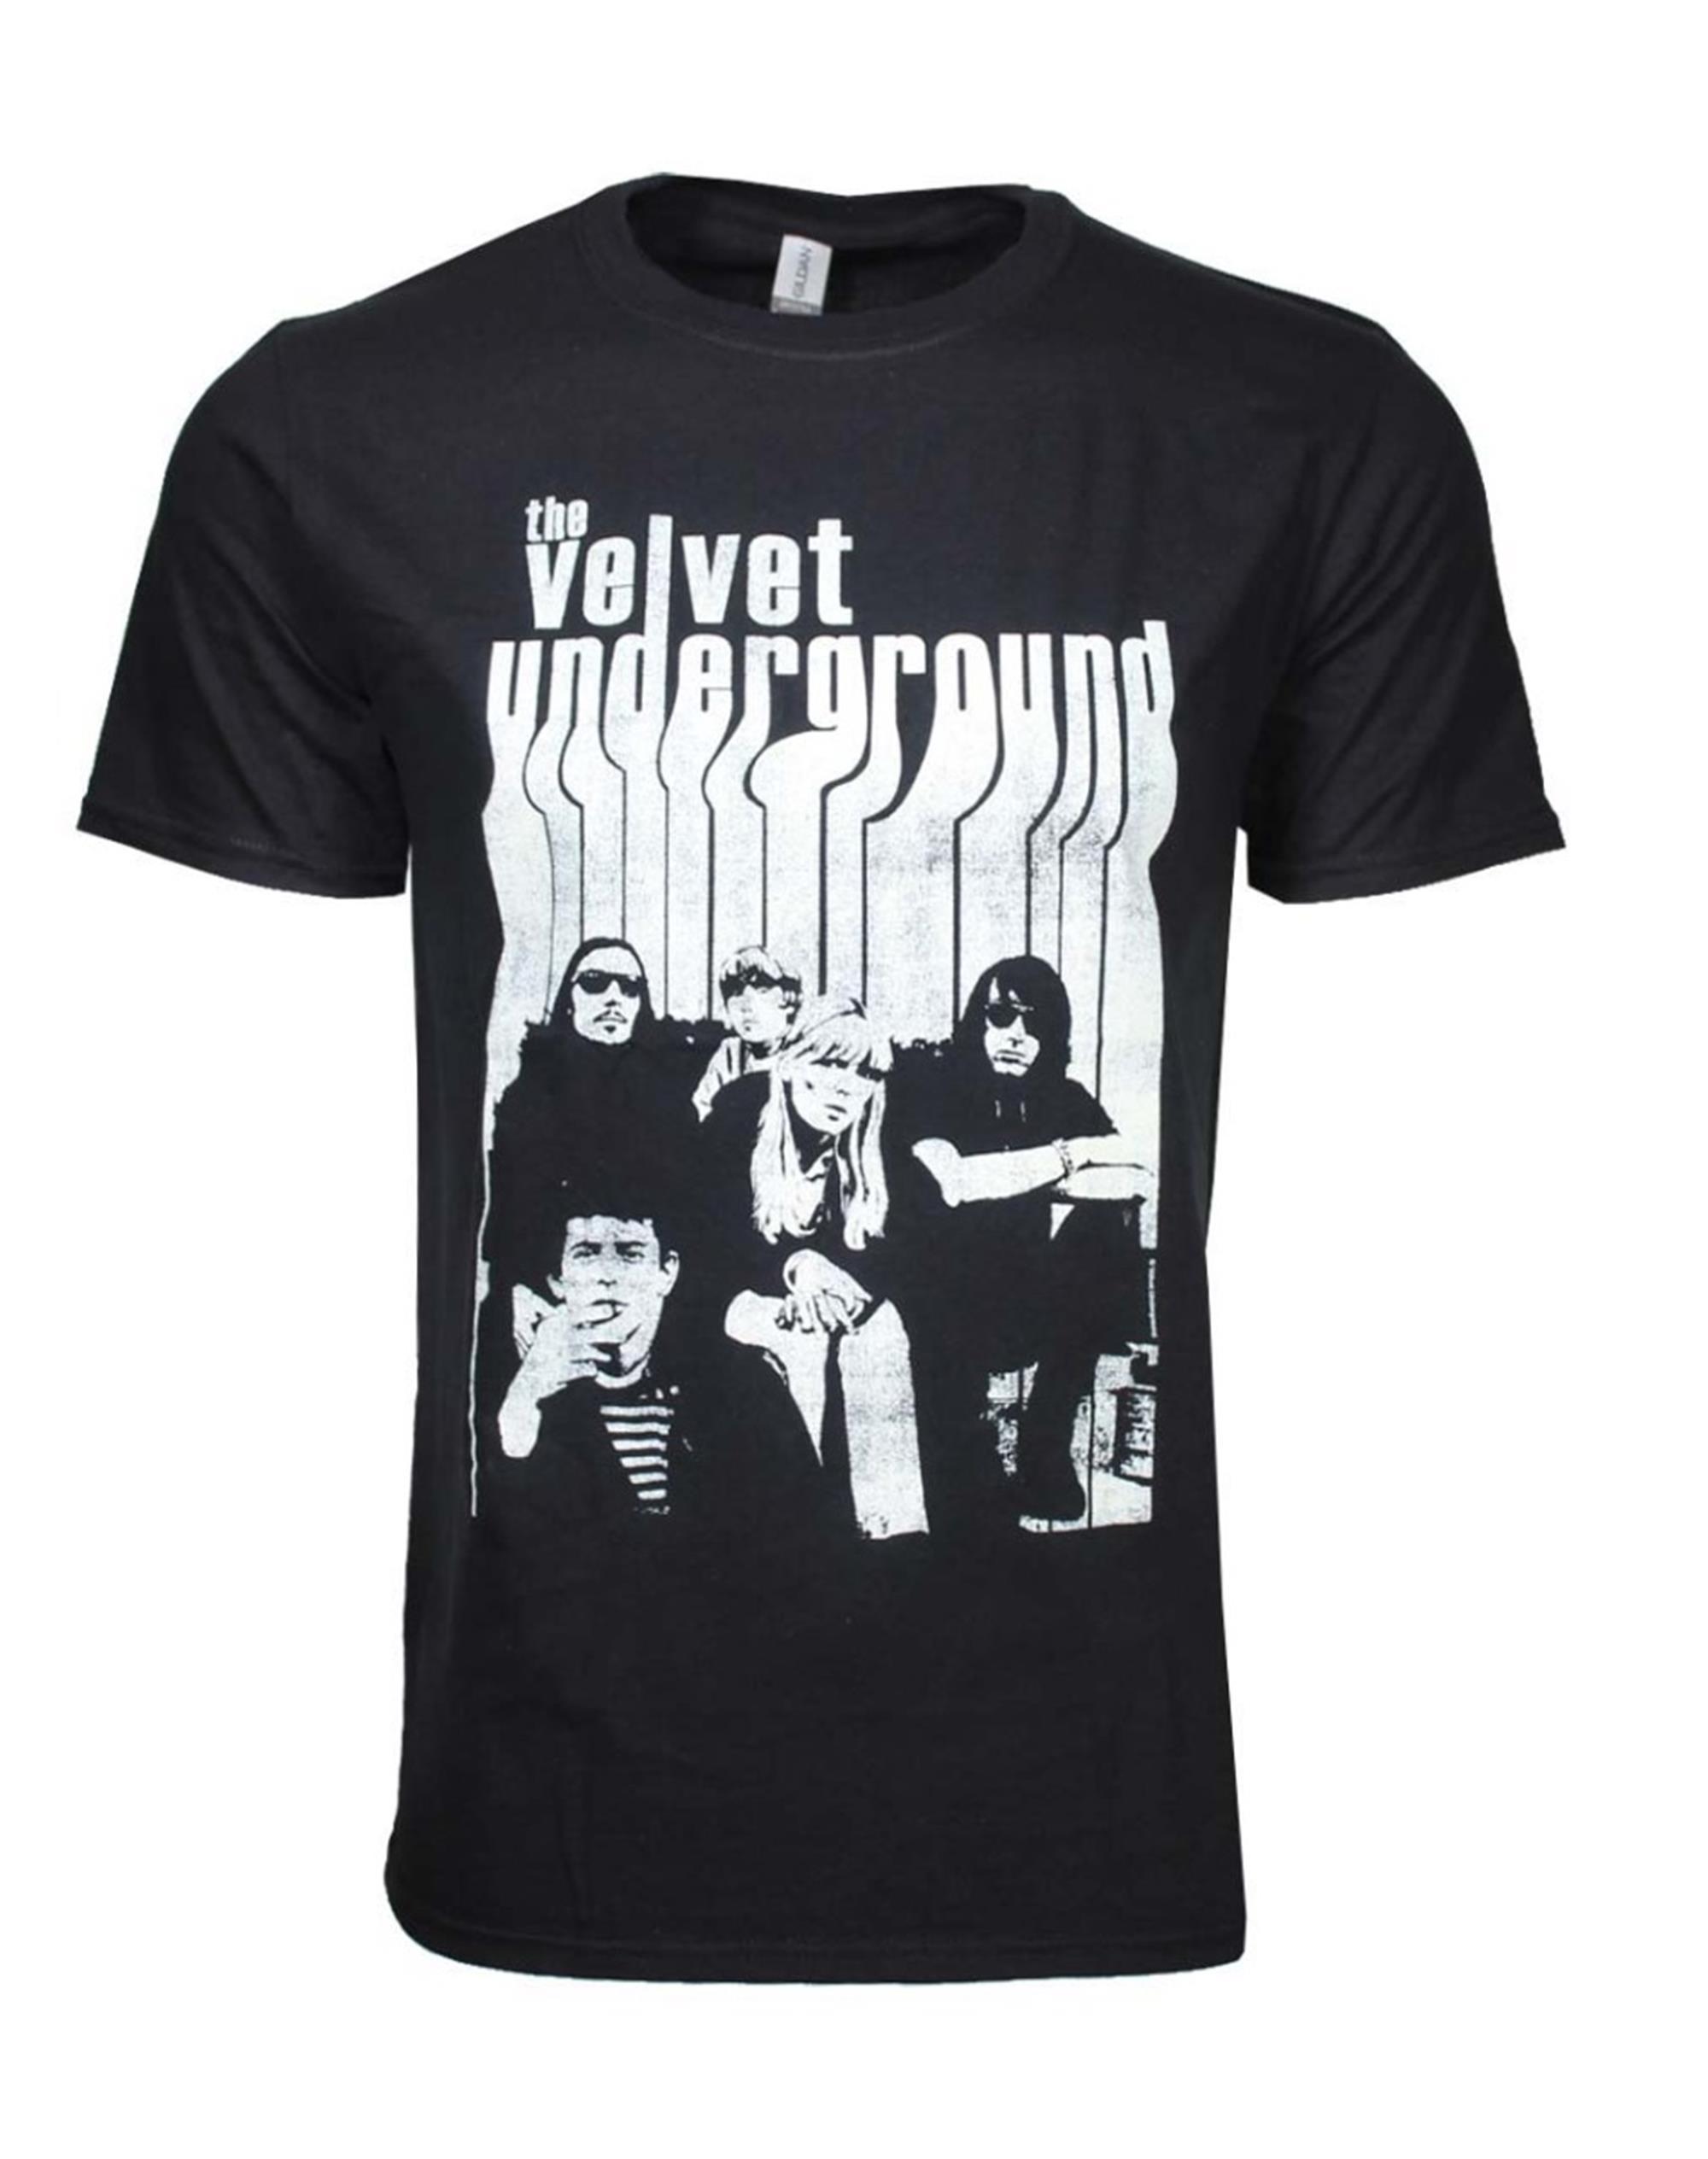 Velvet Underground Band with Nico T-Shirt